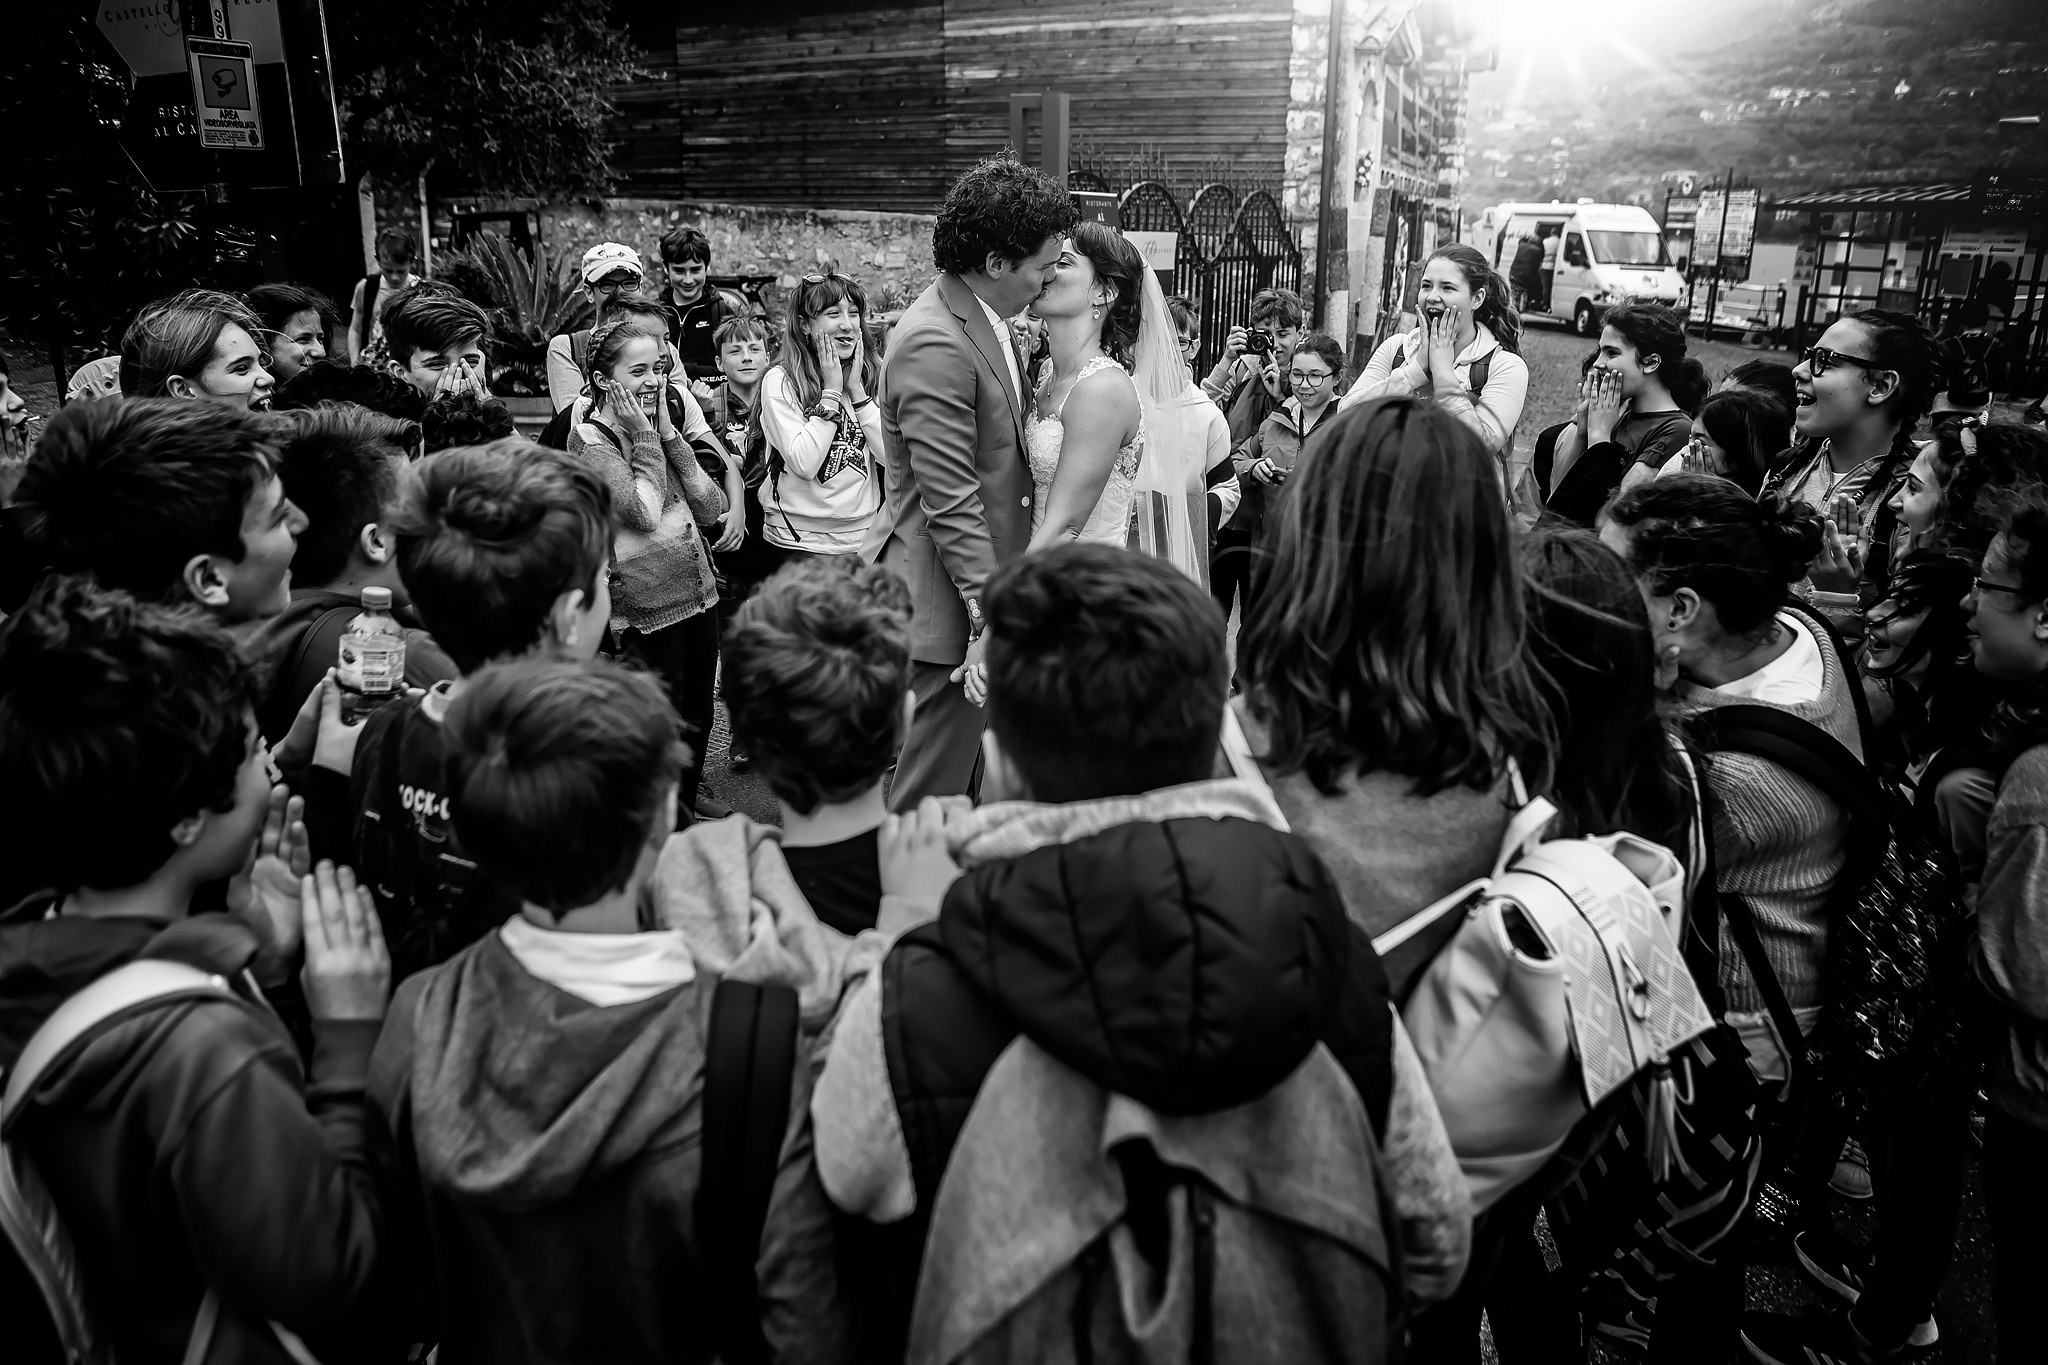 Bruidsreportage Bruidsfotografie Wedding Photographer 067 Bas Driessen Photography